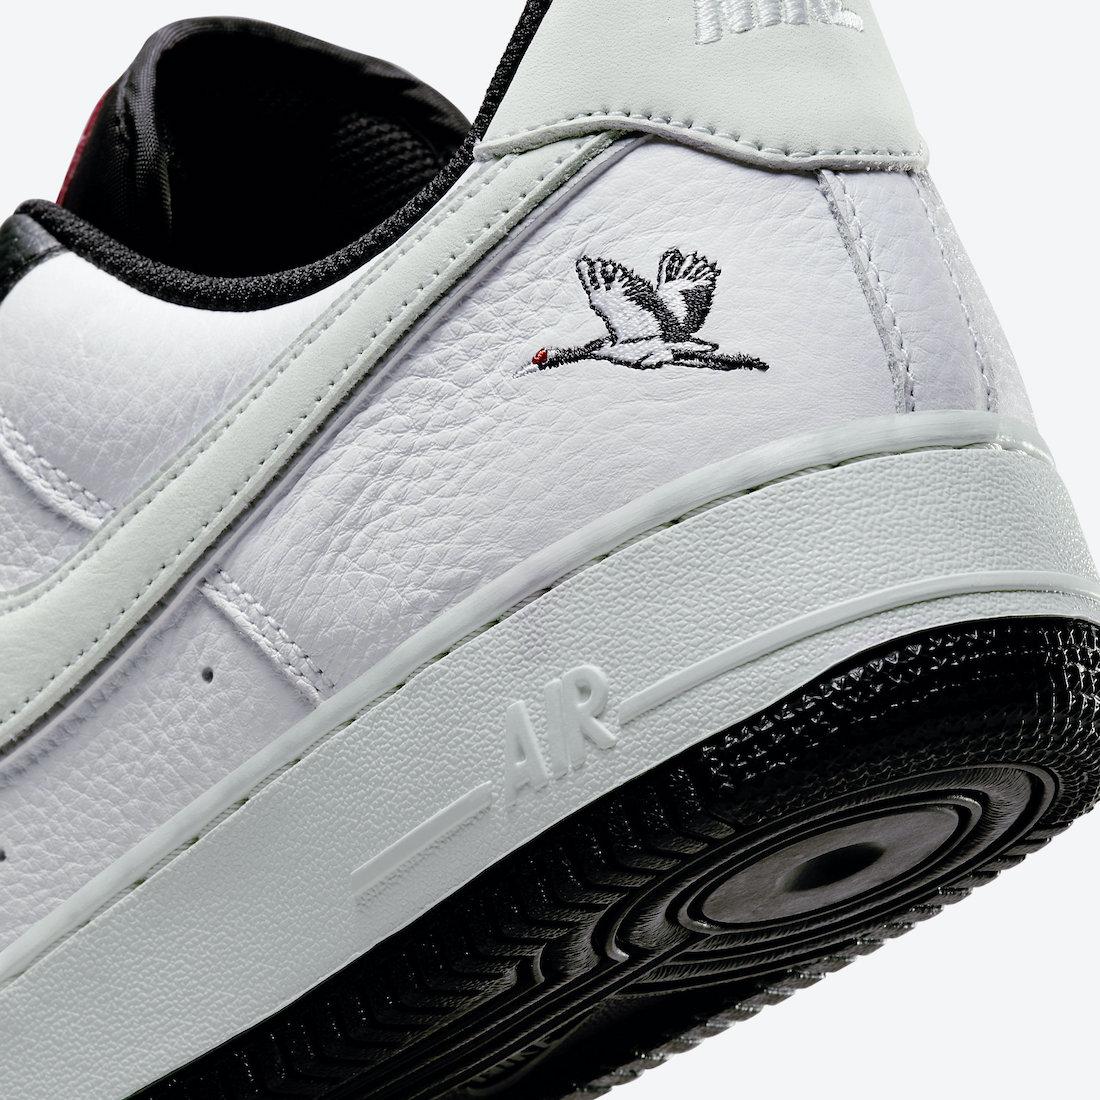 Nike Air Force 1 Low 'Crane' DA8482-100 5